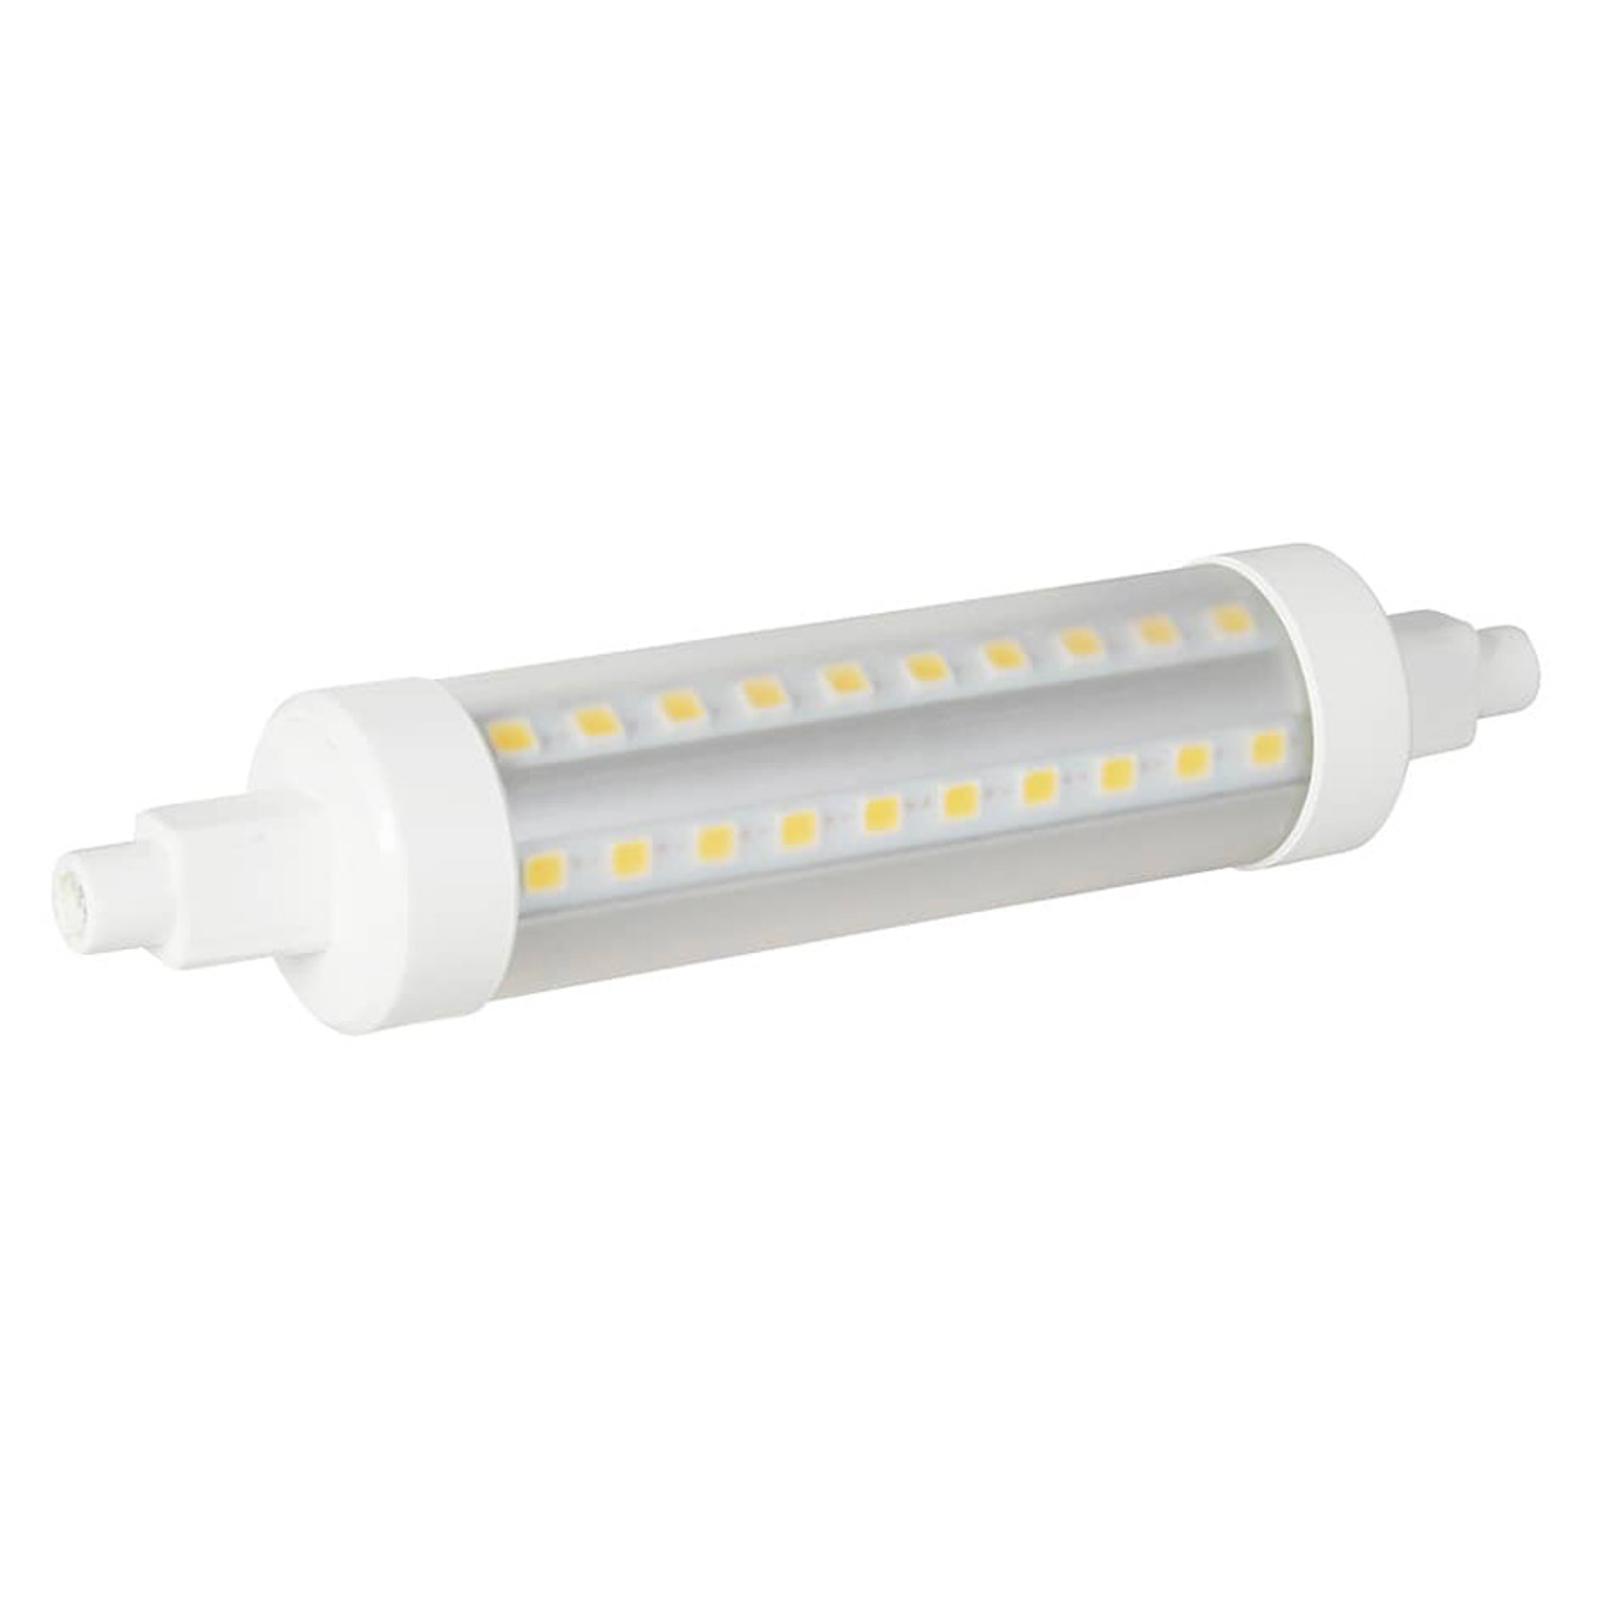 LED-pære VEO R7S 118 mm 14 W varmhvit 2700 K